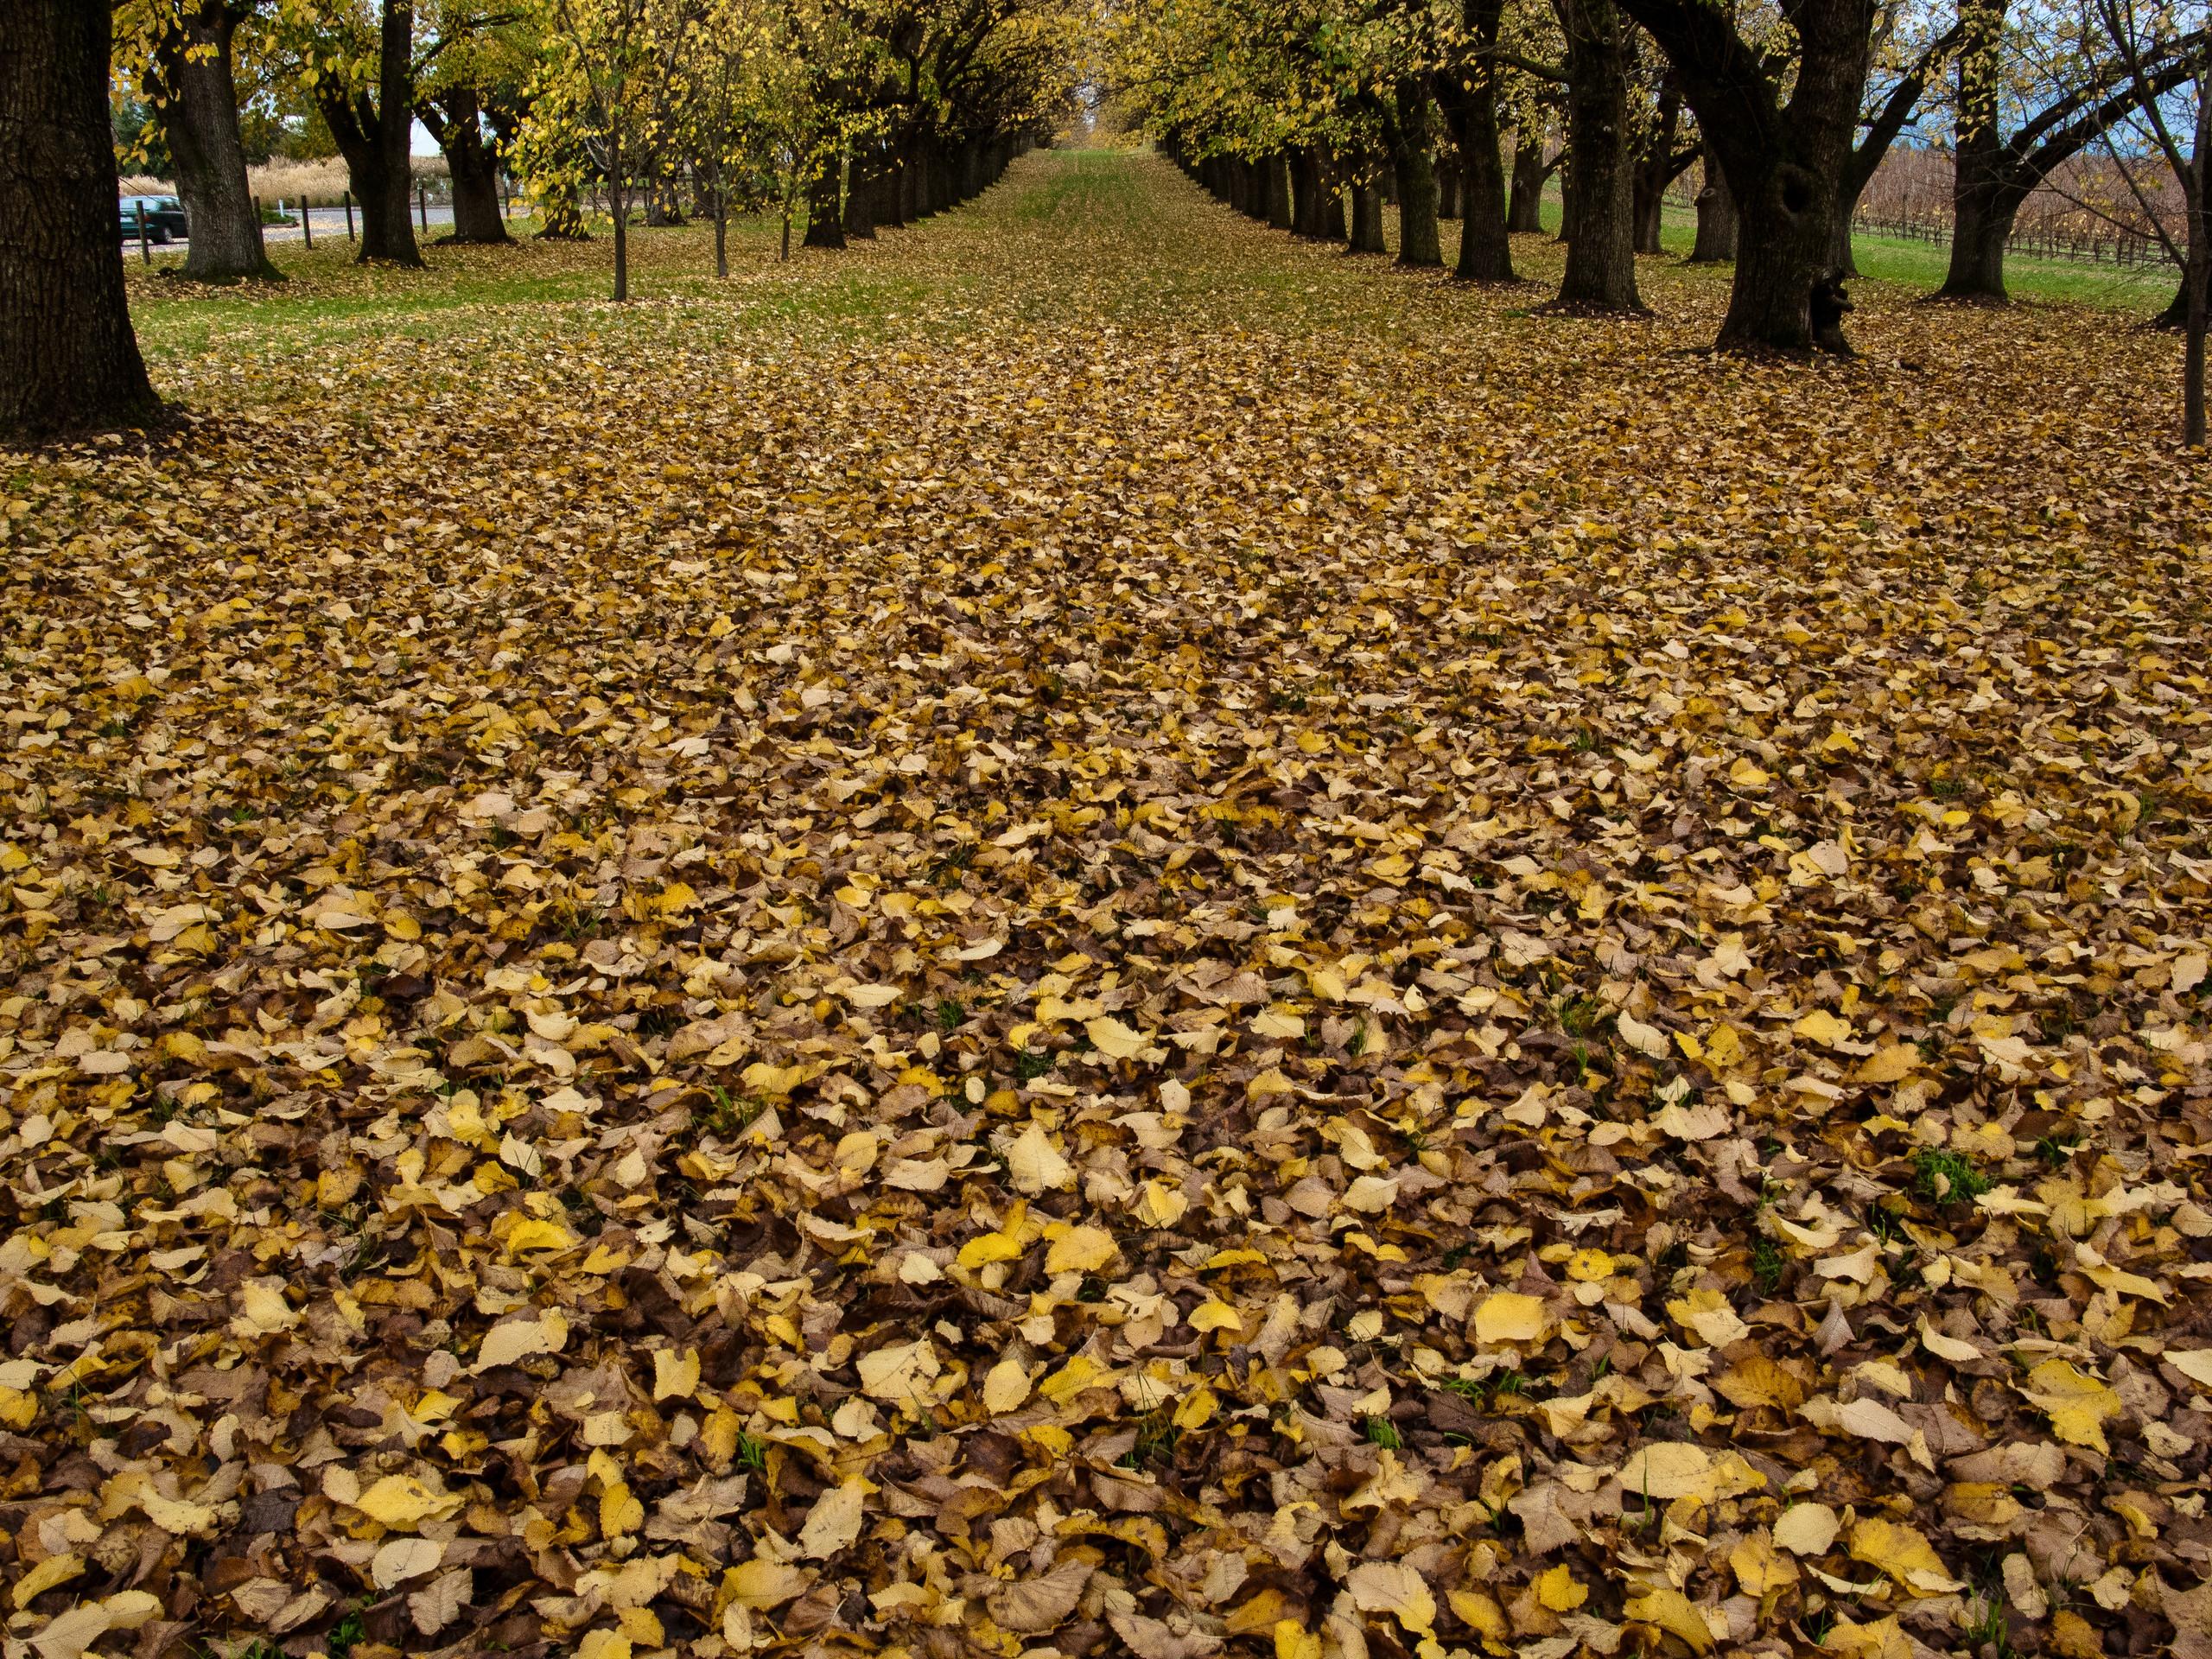 Autumn leaves in Healesville in Victoria's Yarra valley